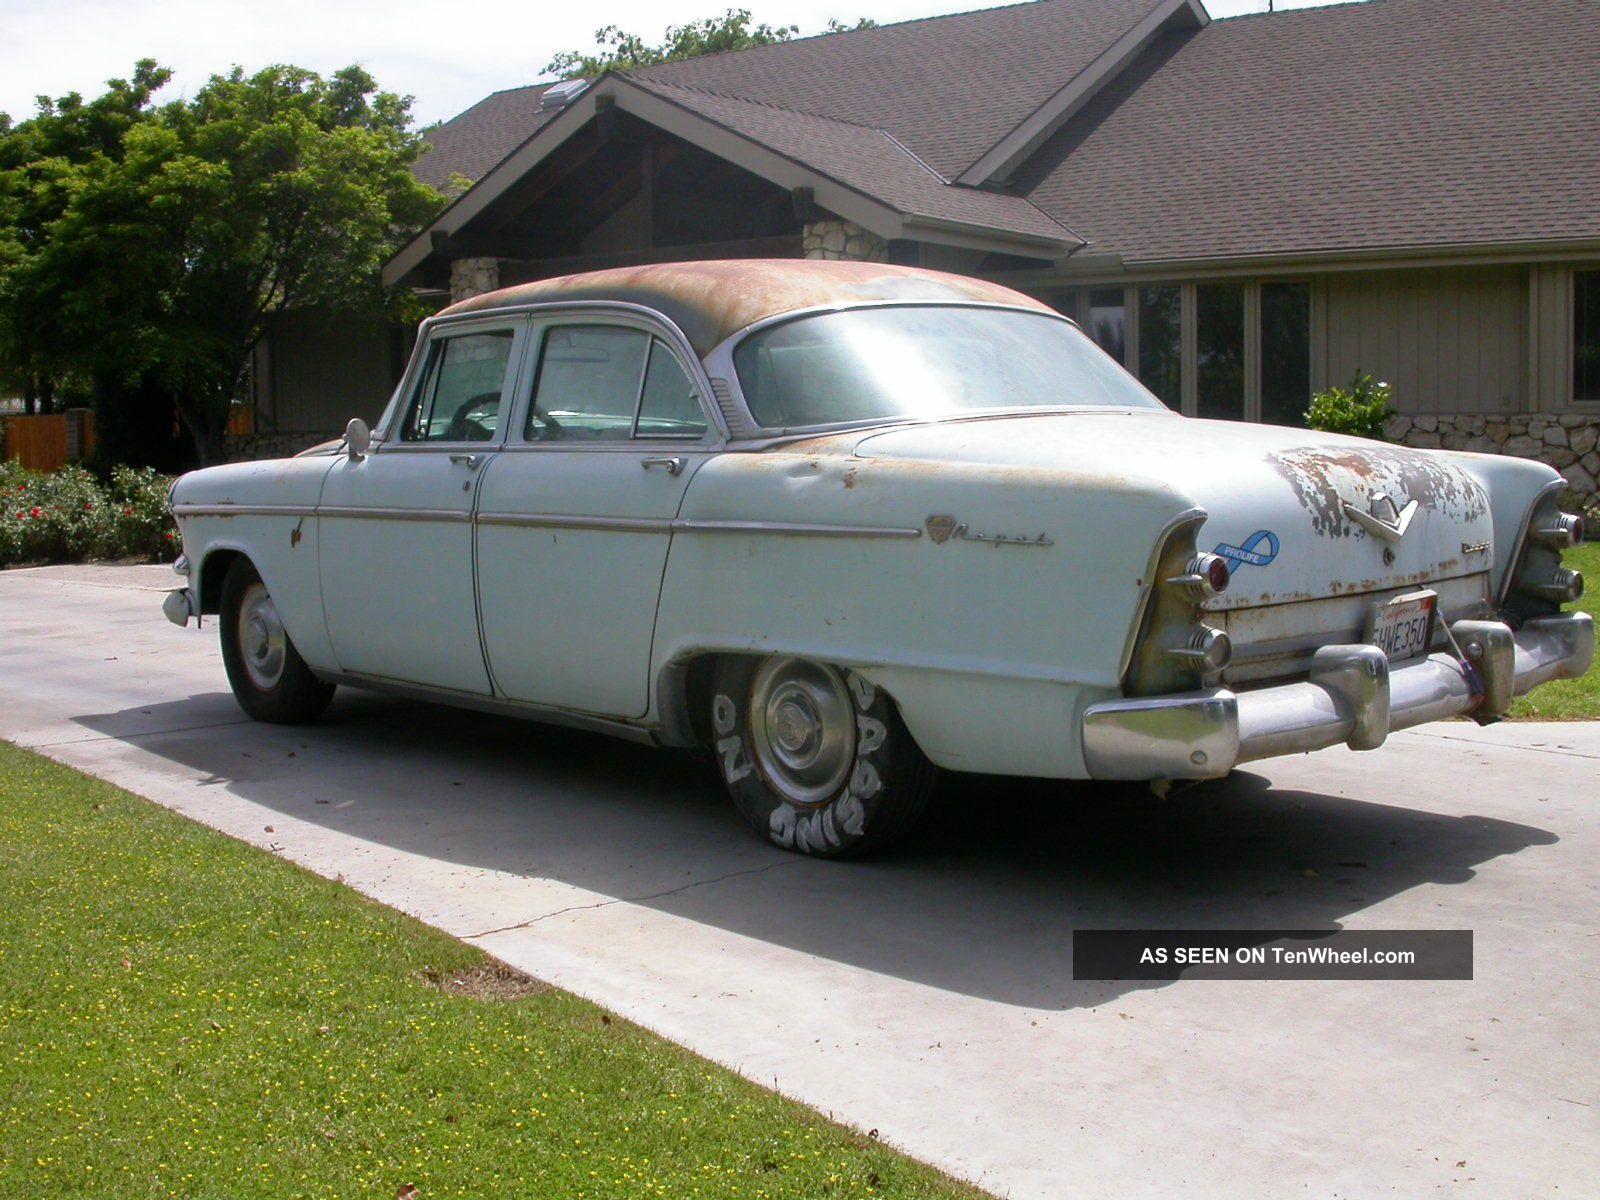 1955 dodge custom royal lancer 4 door sedan 15699 - 1955 Dodge Royal 4 Door For Sale Photos Technical 640x480 1955